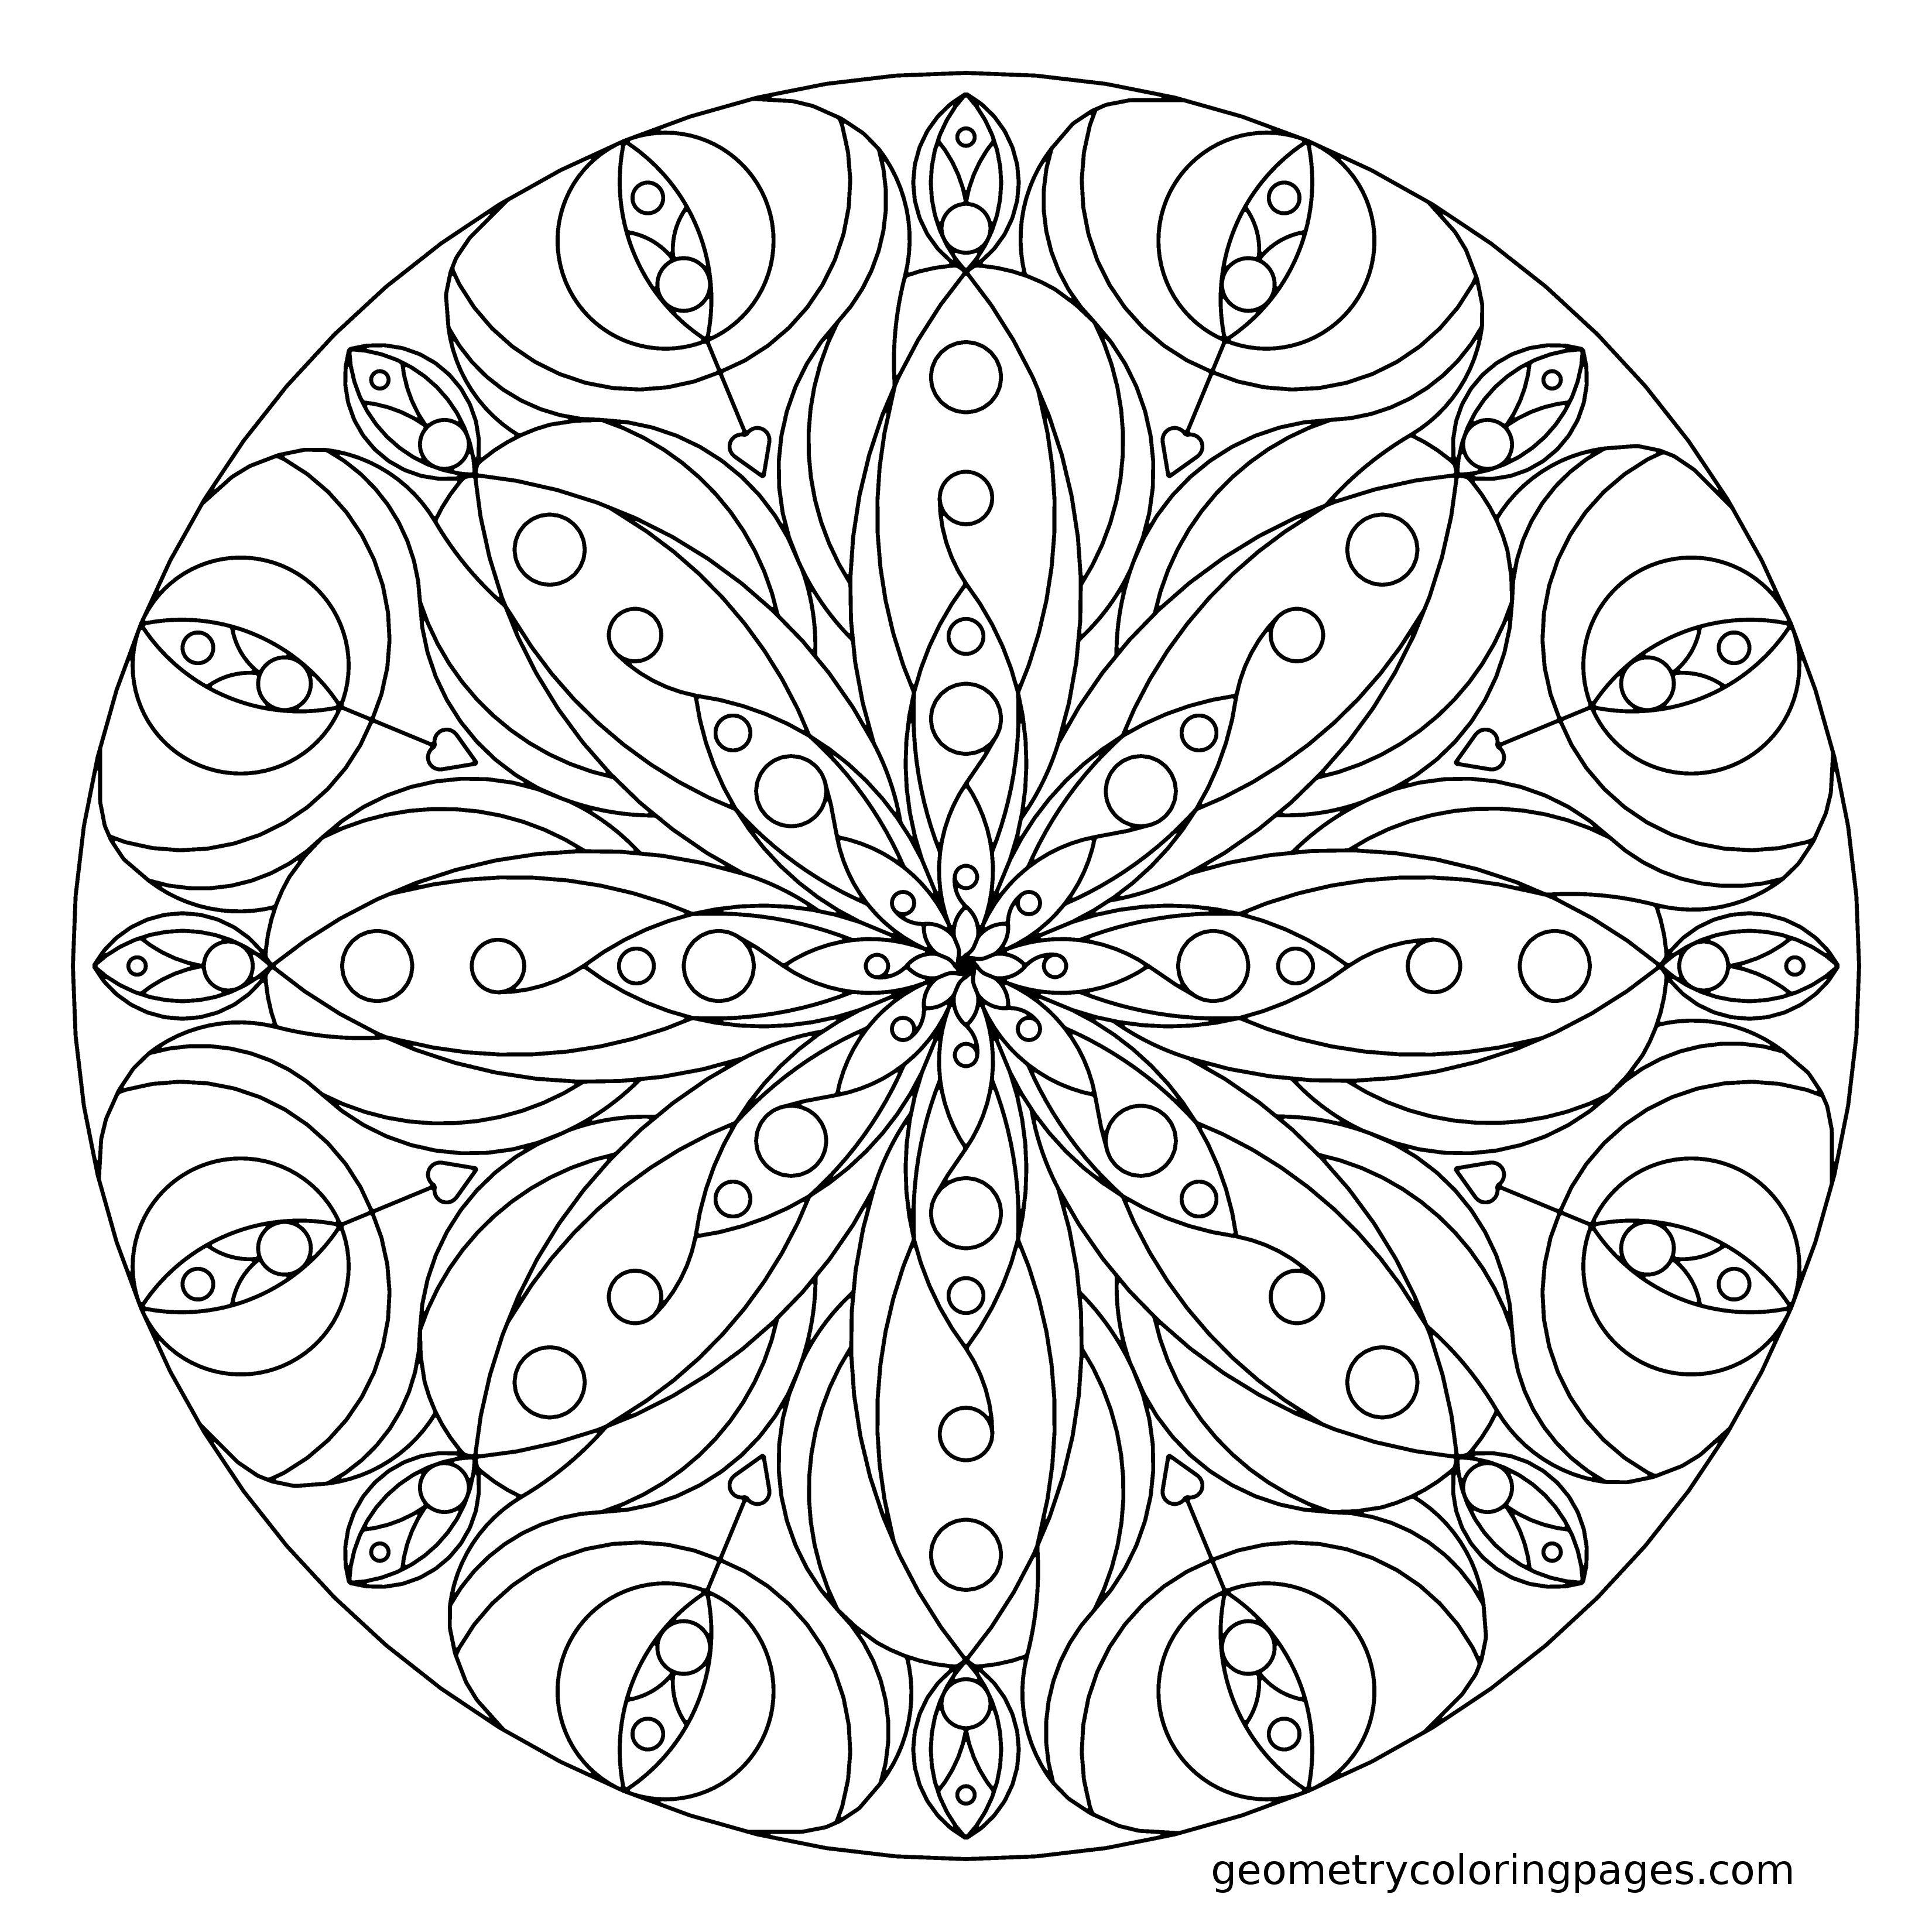 heart mandala coloring pages geometry coloring pages mandalas geo osv pinterest tegninger. Black Bedroom Furniture Sets. Home Design Ideas